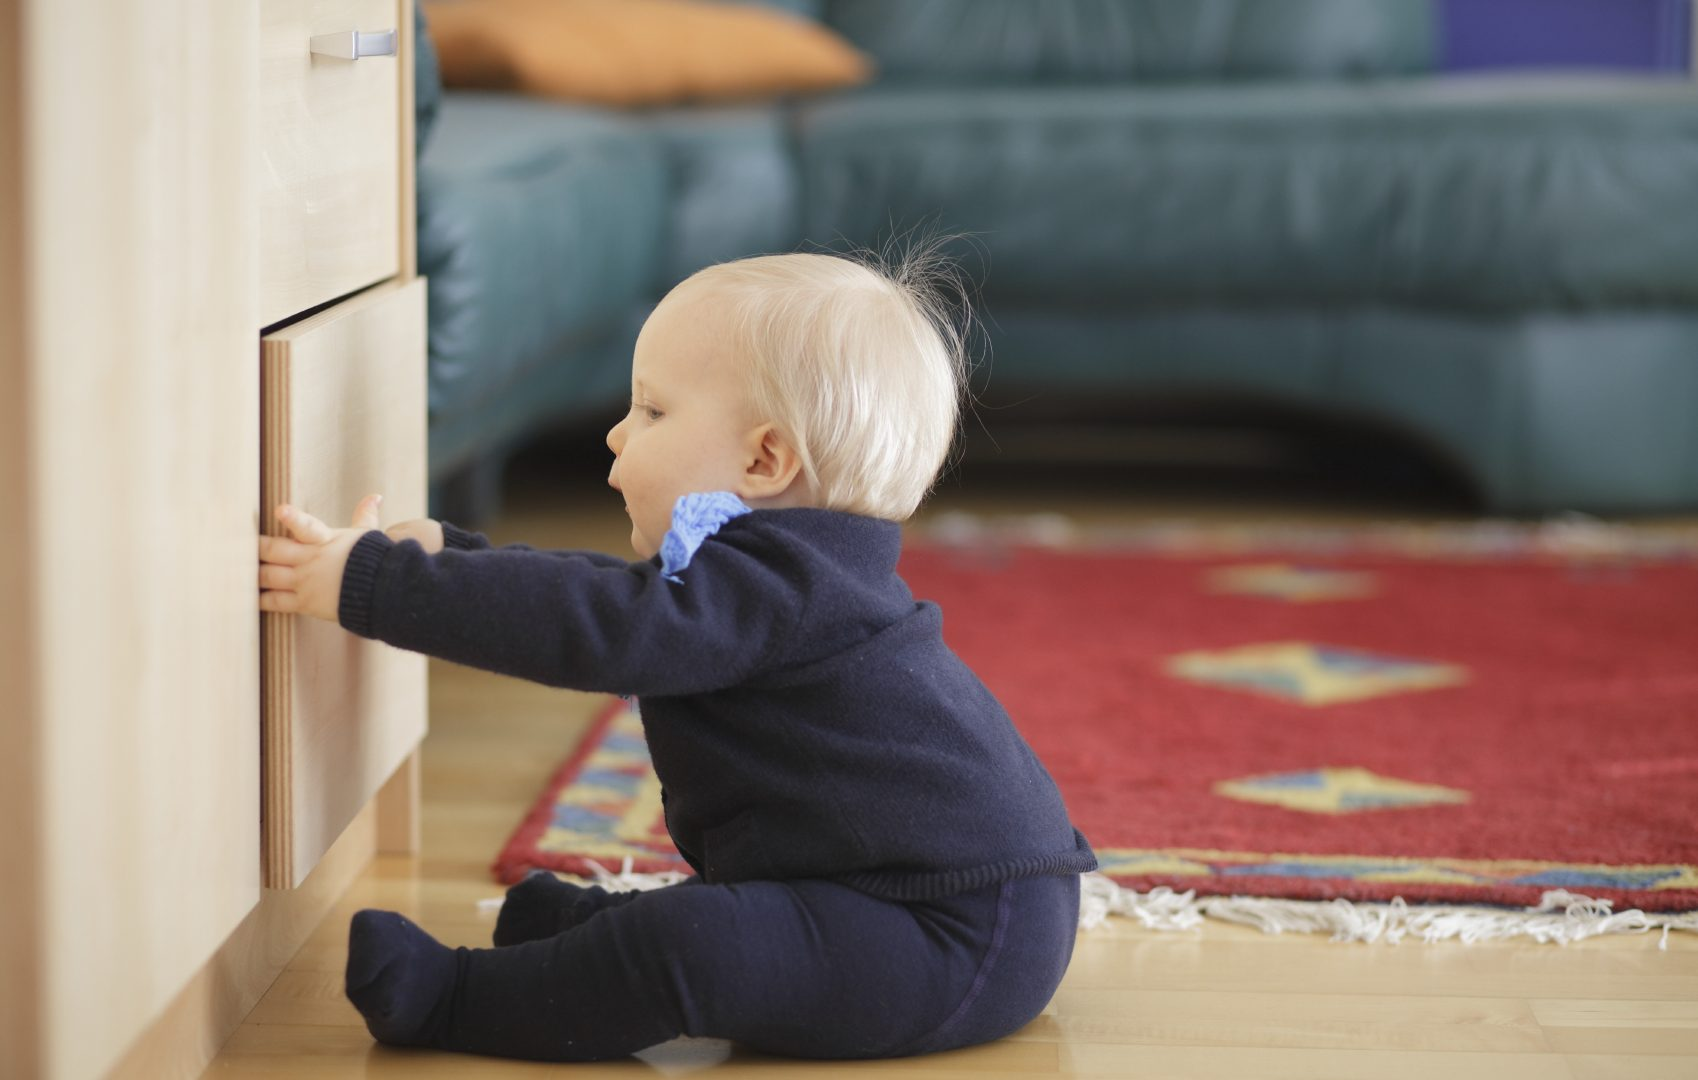 baby kindersicher wohung neugierig tipps. Black Bedroom Furniture Sets. Home Design Ideas